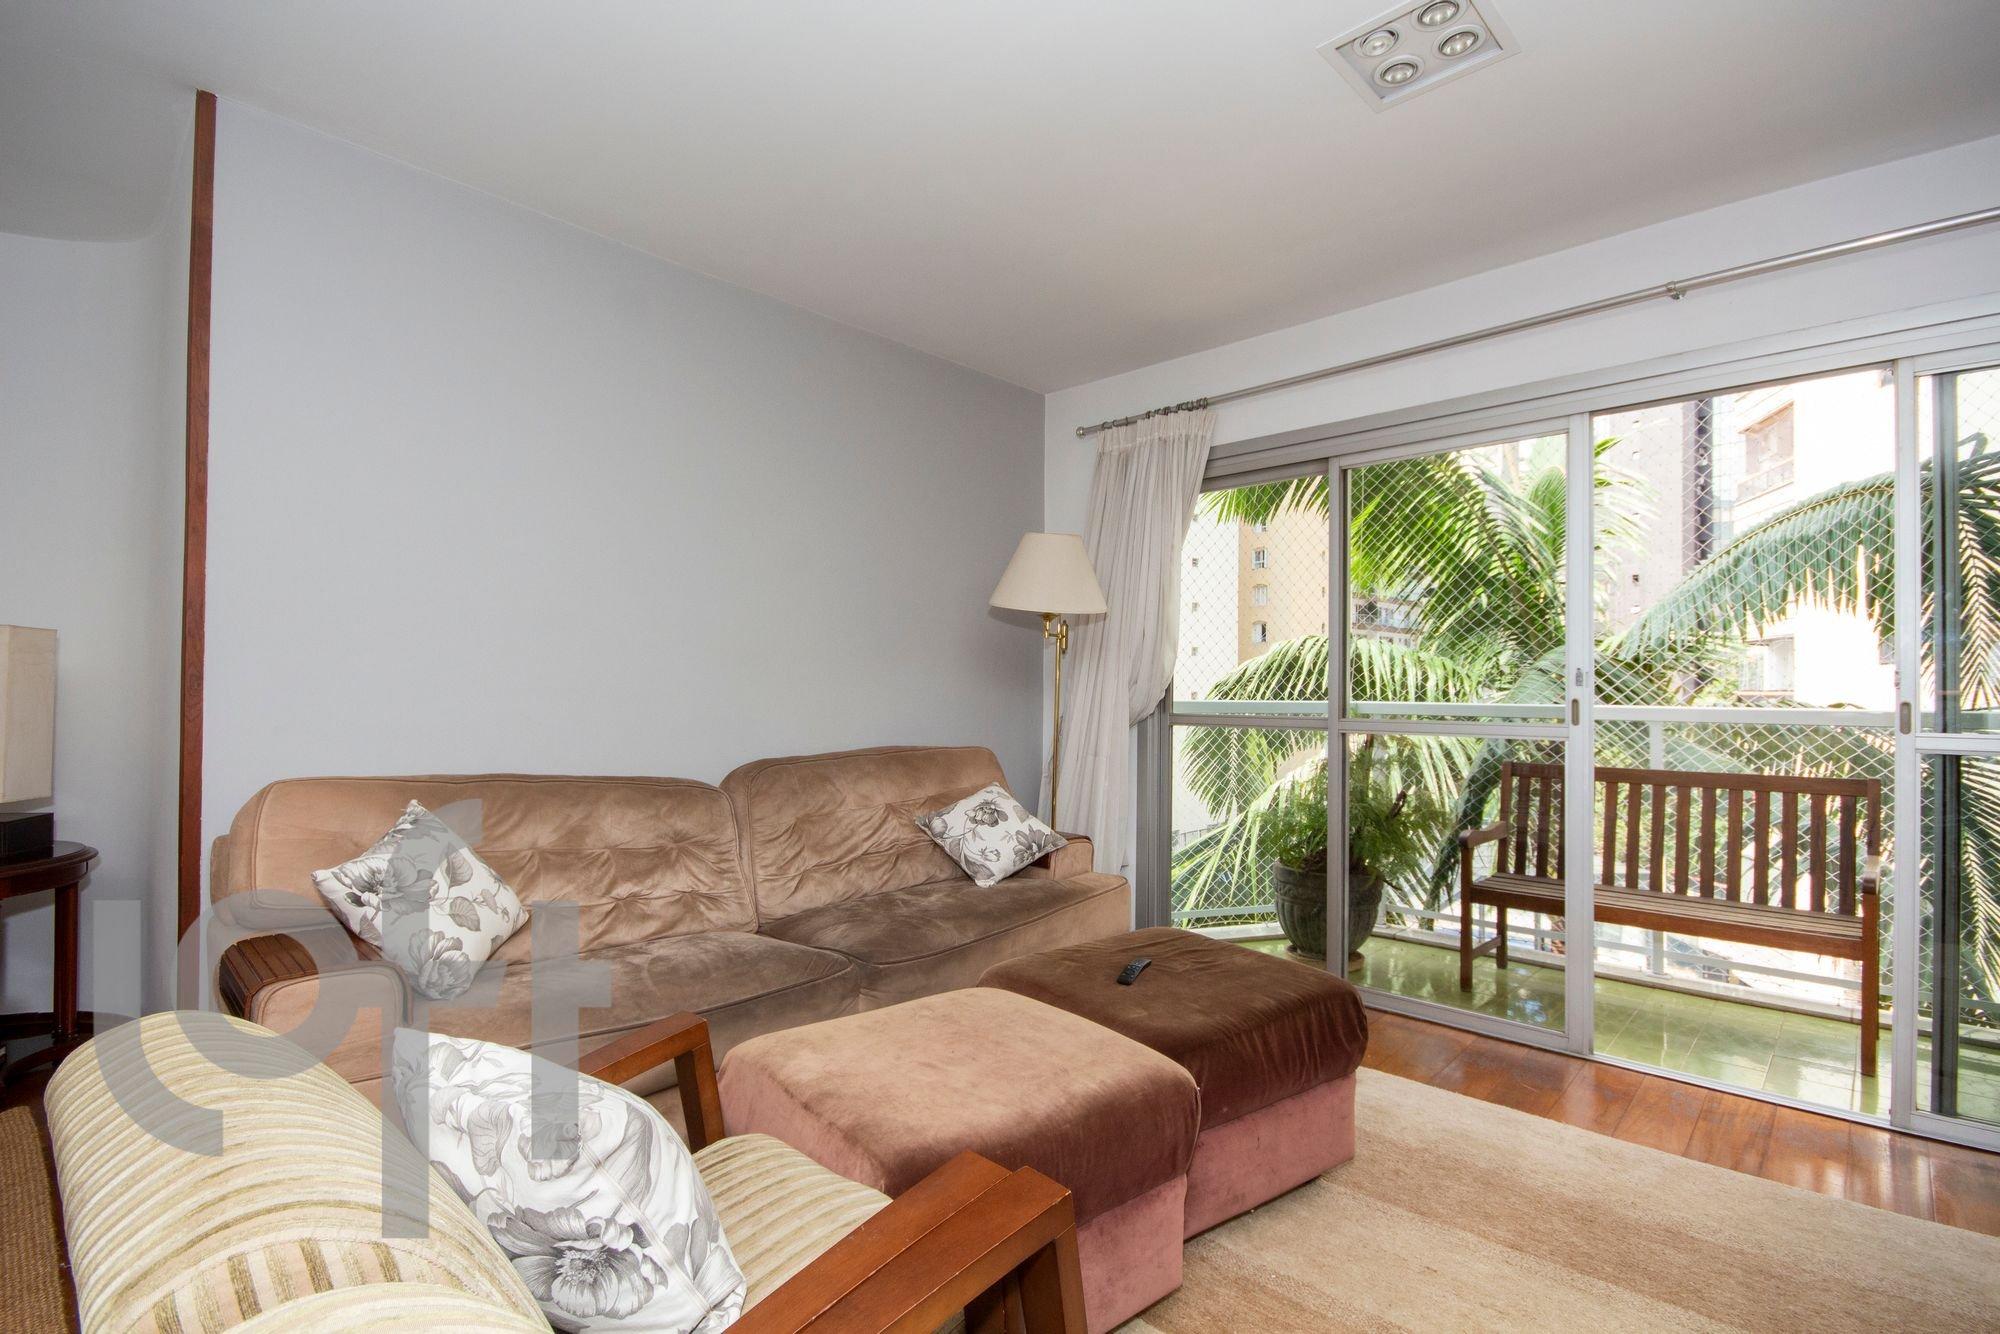 Foto de Quarto com vaso de planta, banco, sofá